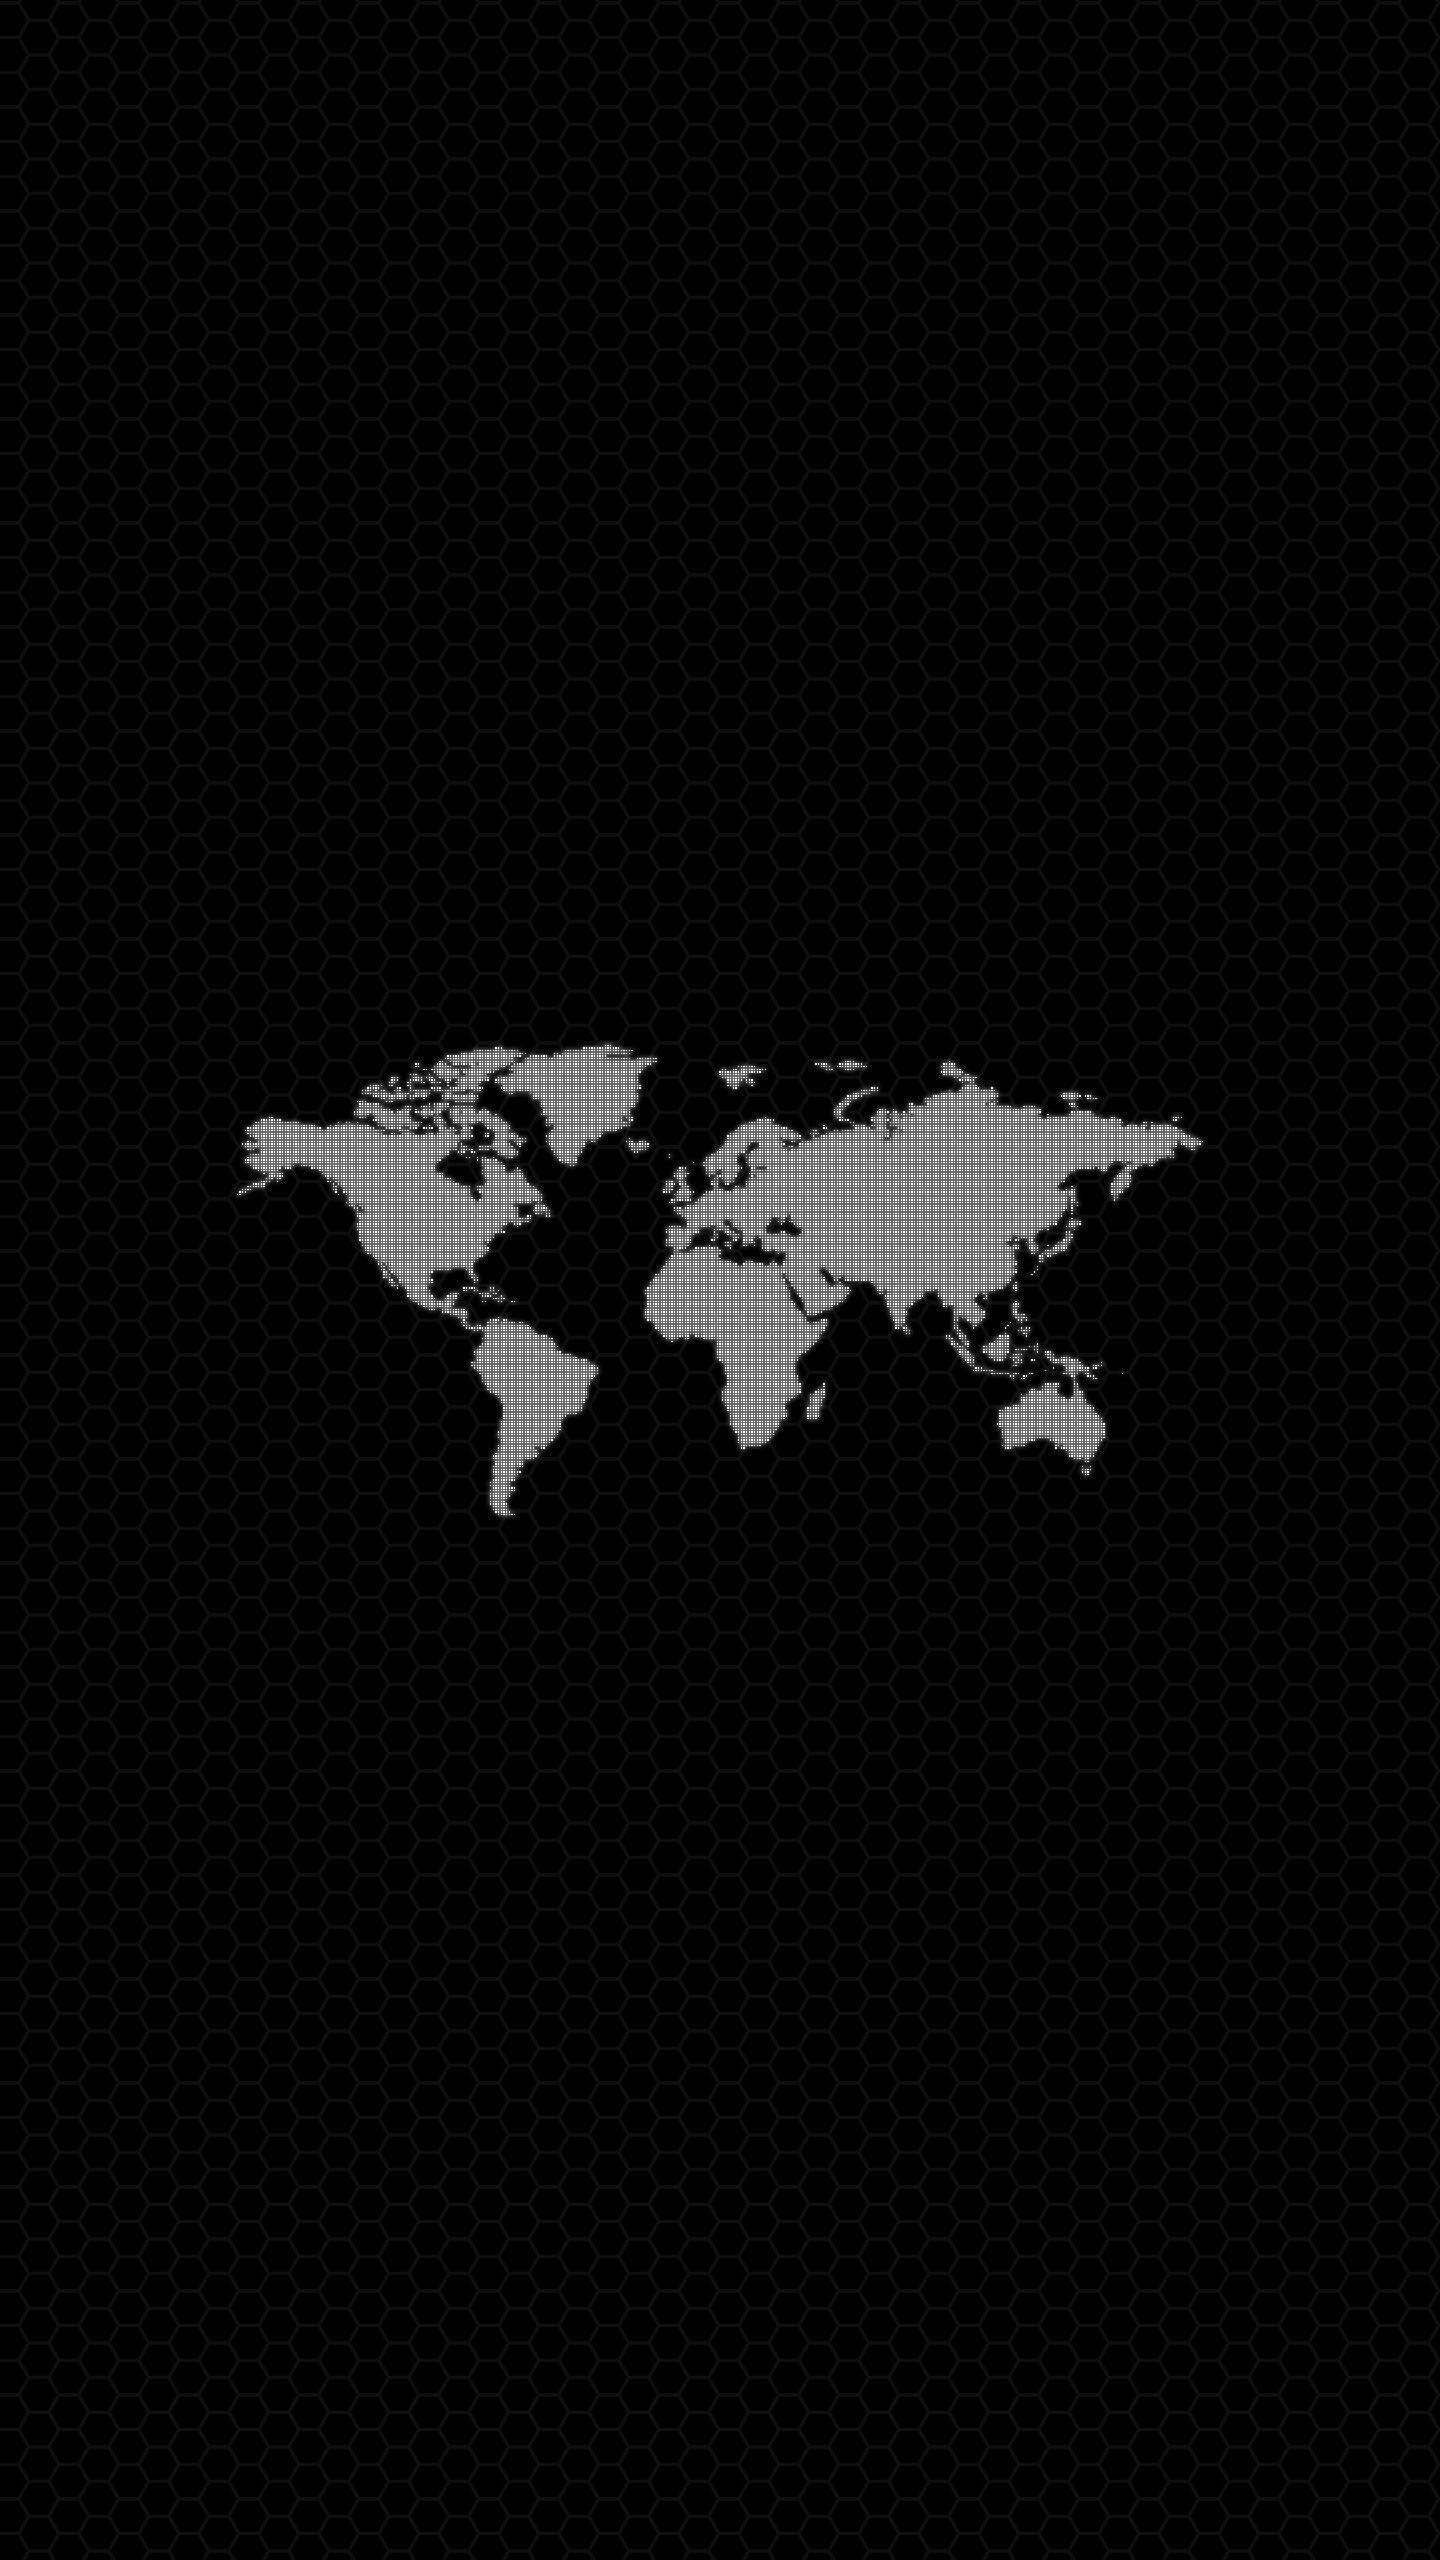 Minimalist World Map Wallpapers Top Free Minimalist World